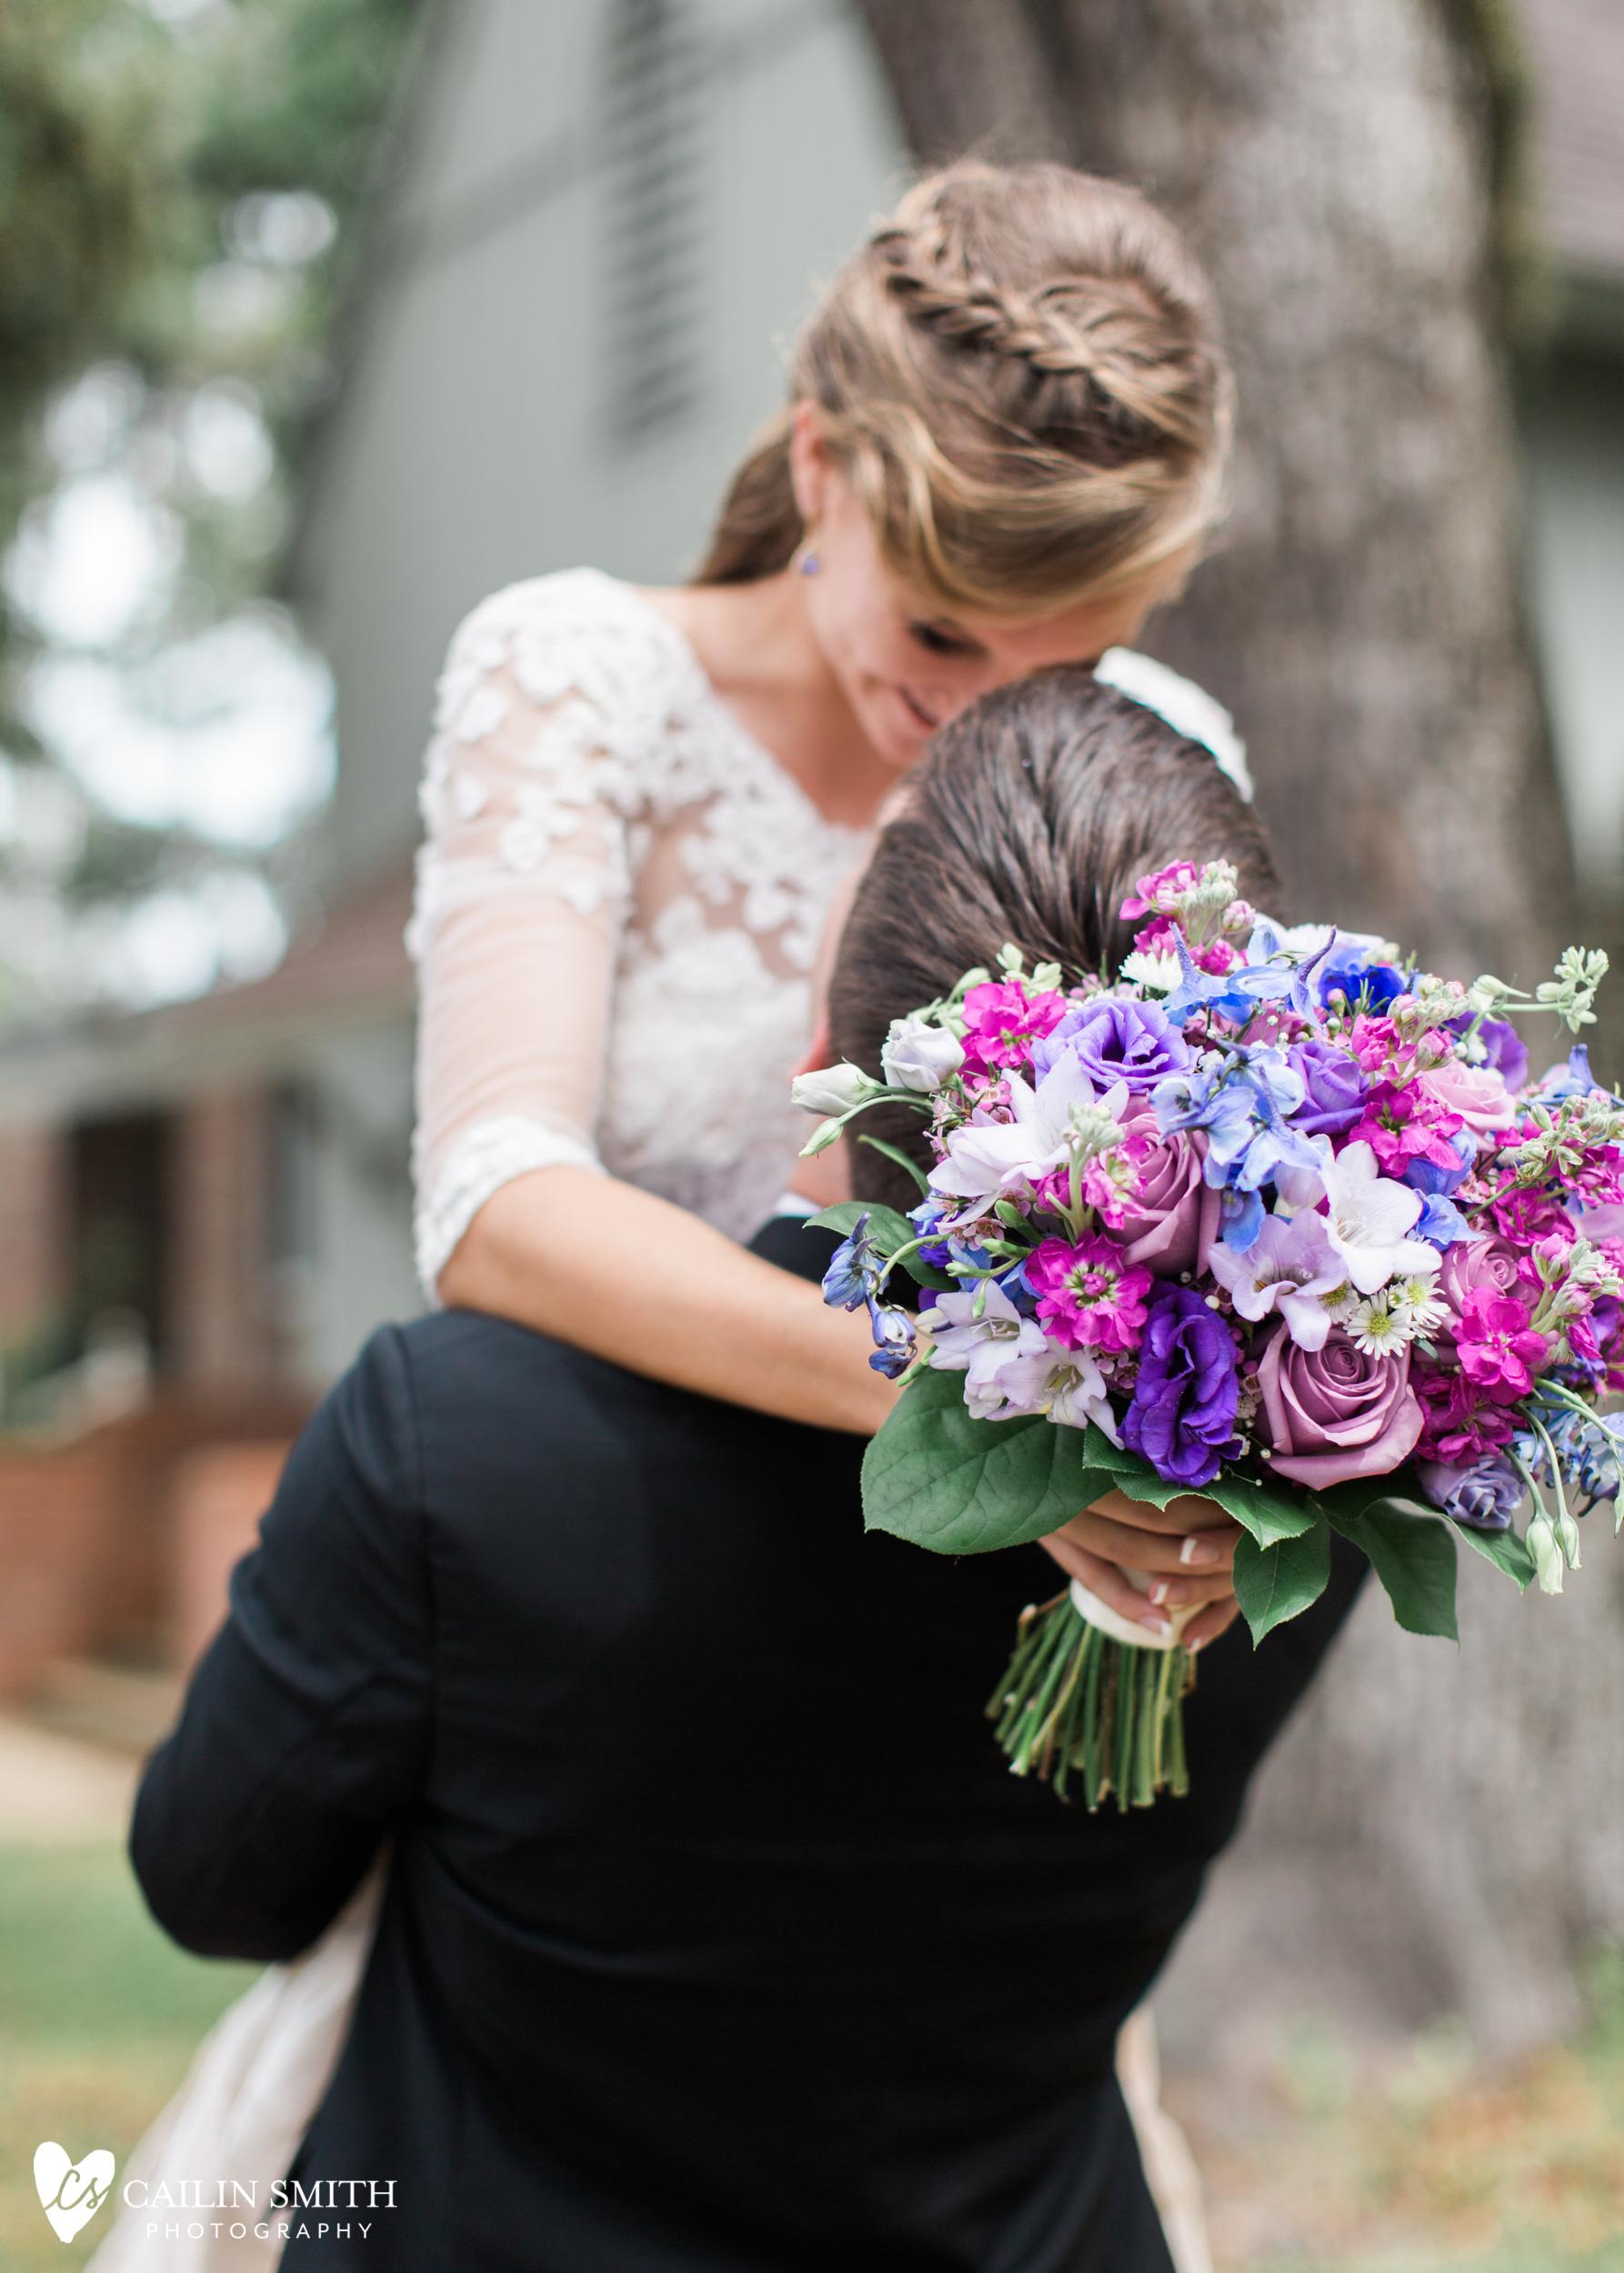 Shannon_David_Grace_Episcopal_Church_Wedding_photography_005.jpg